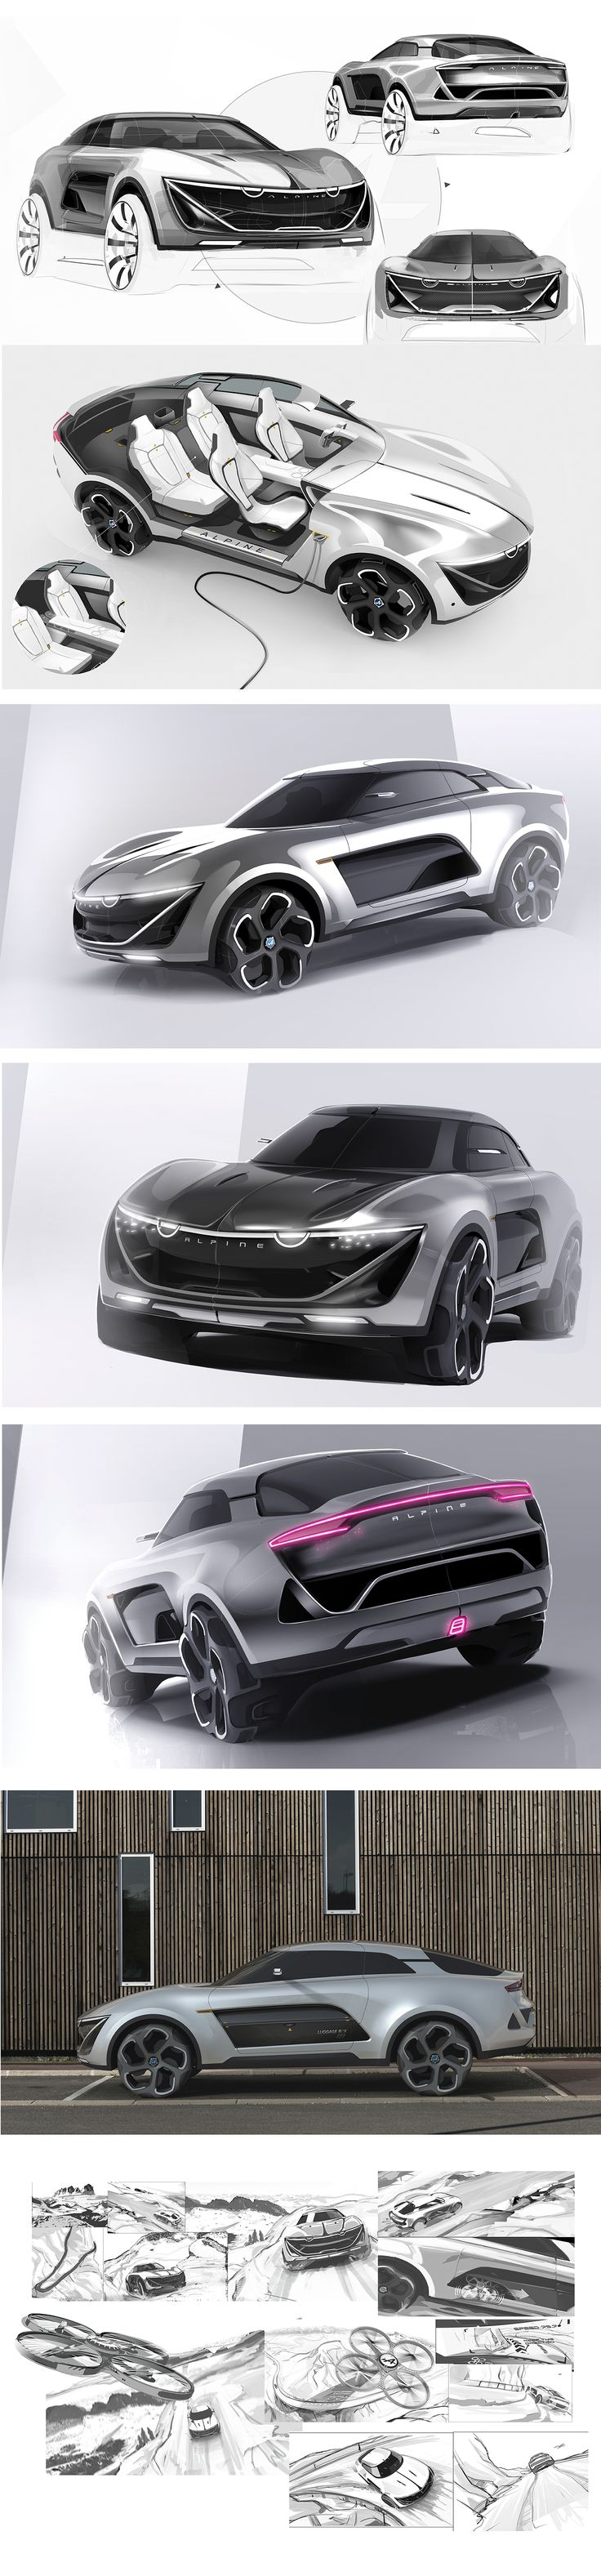 Alpine SUV 2025 on Behance